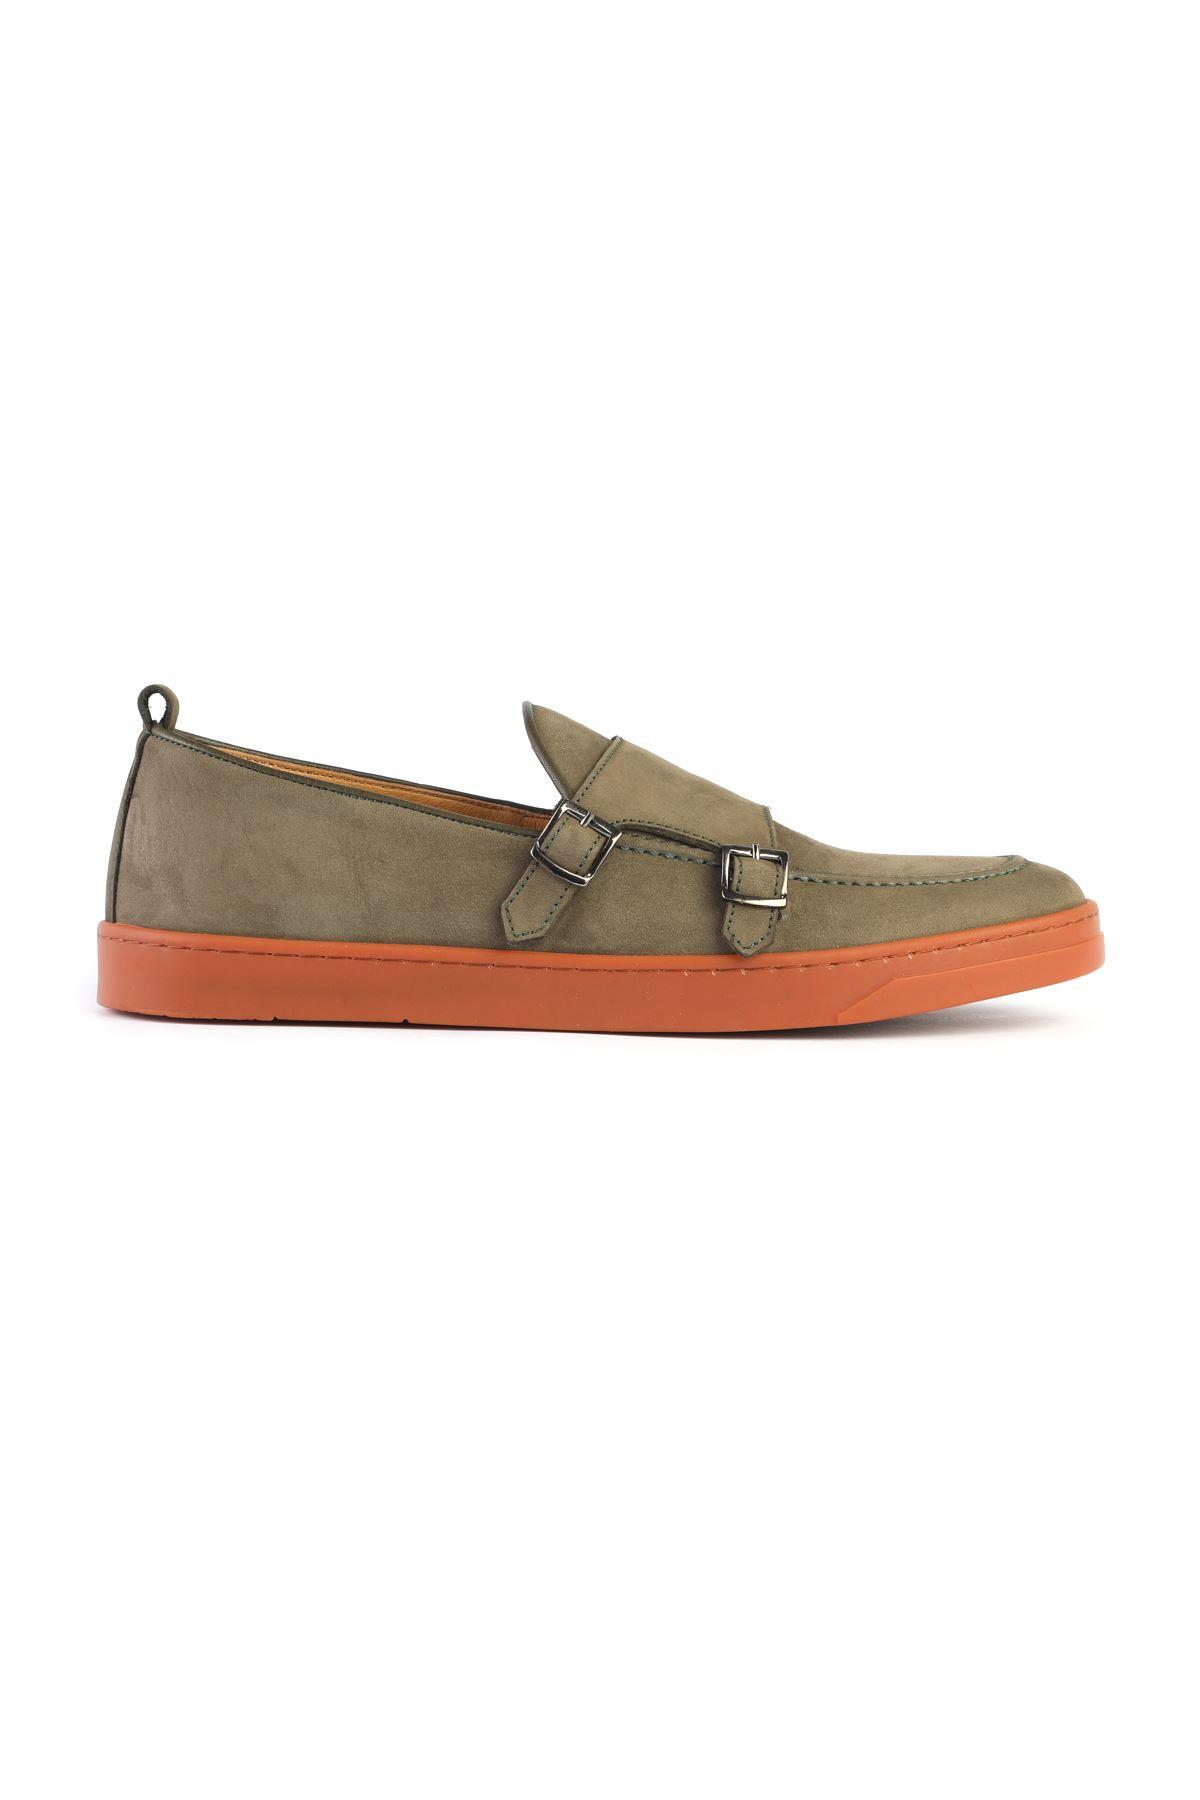 Libero 3357 Khaki Loafer Shoes